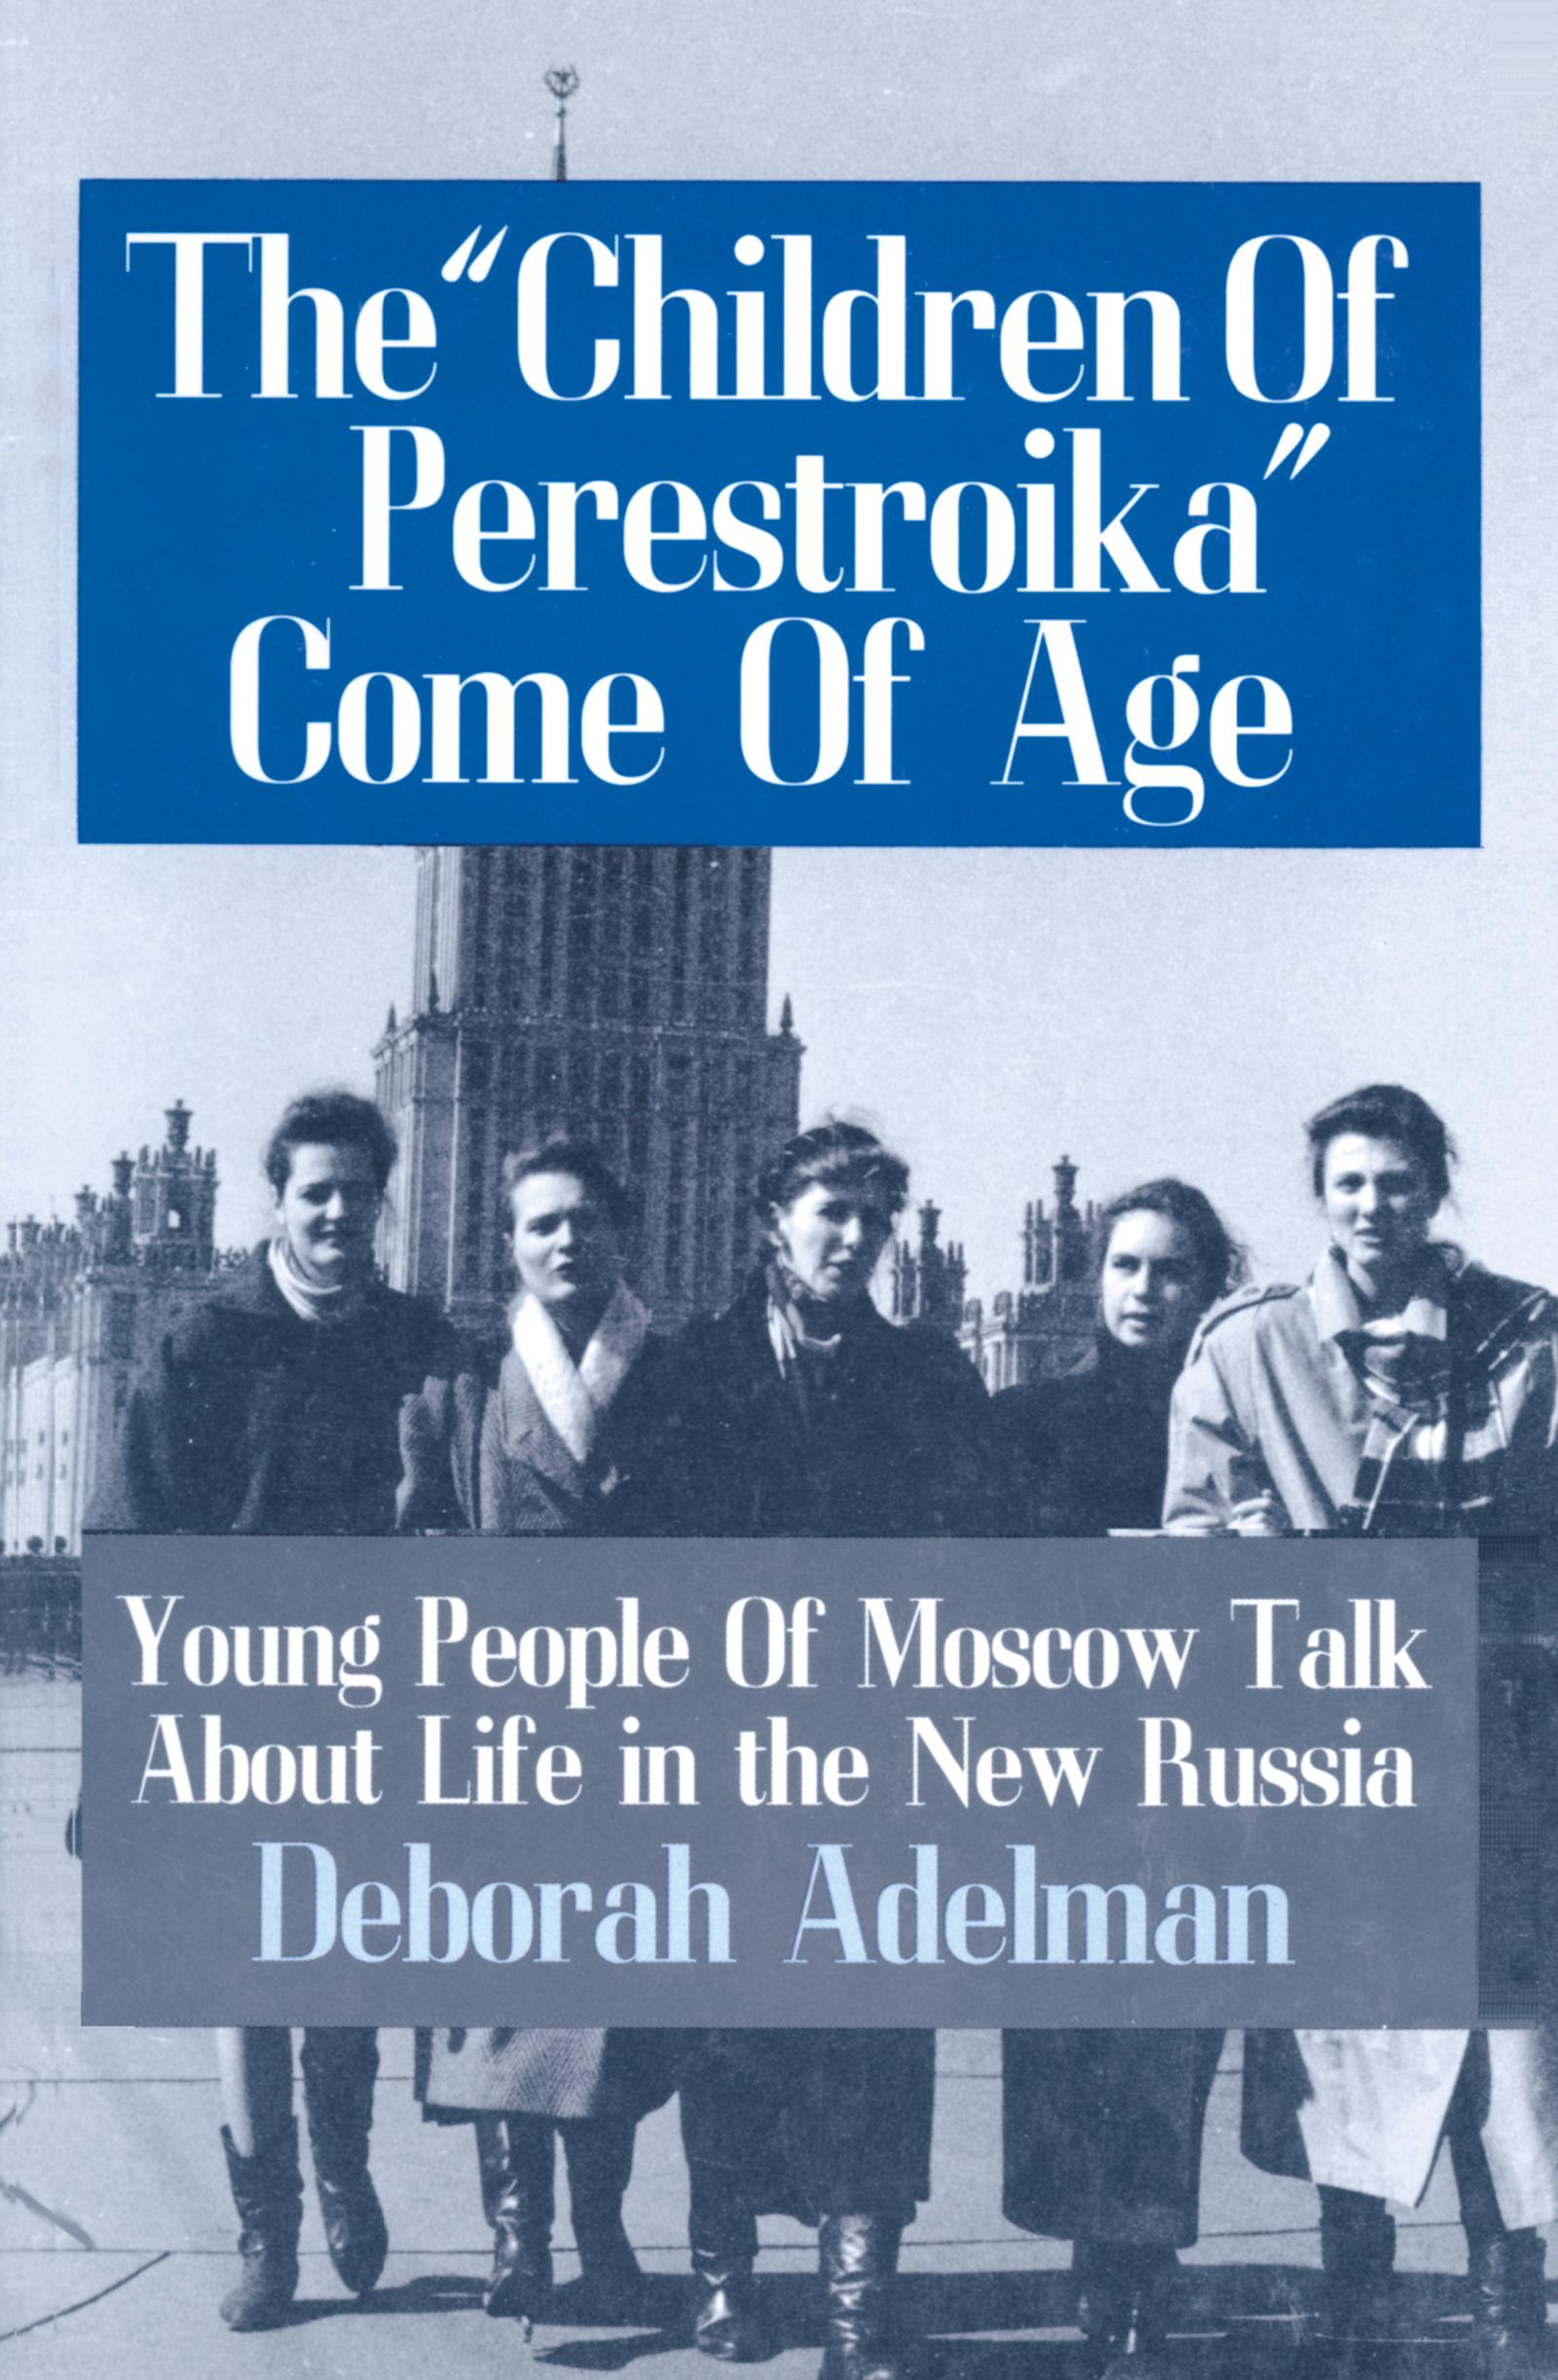 The Children of Perestroika Come of Age